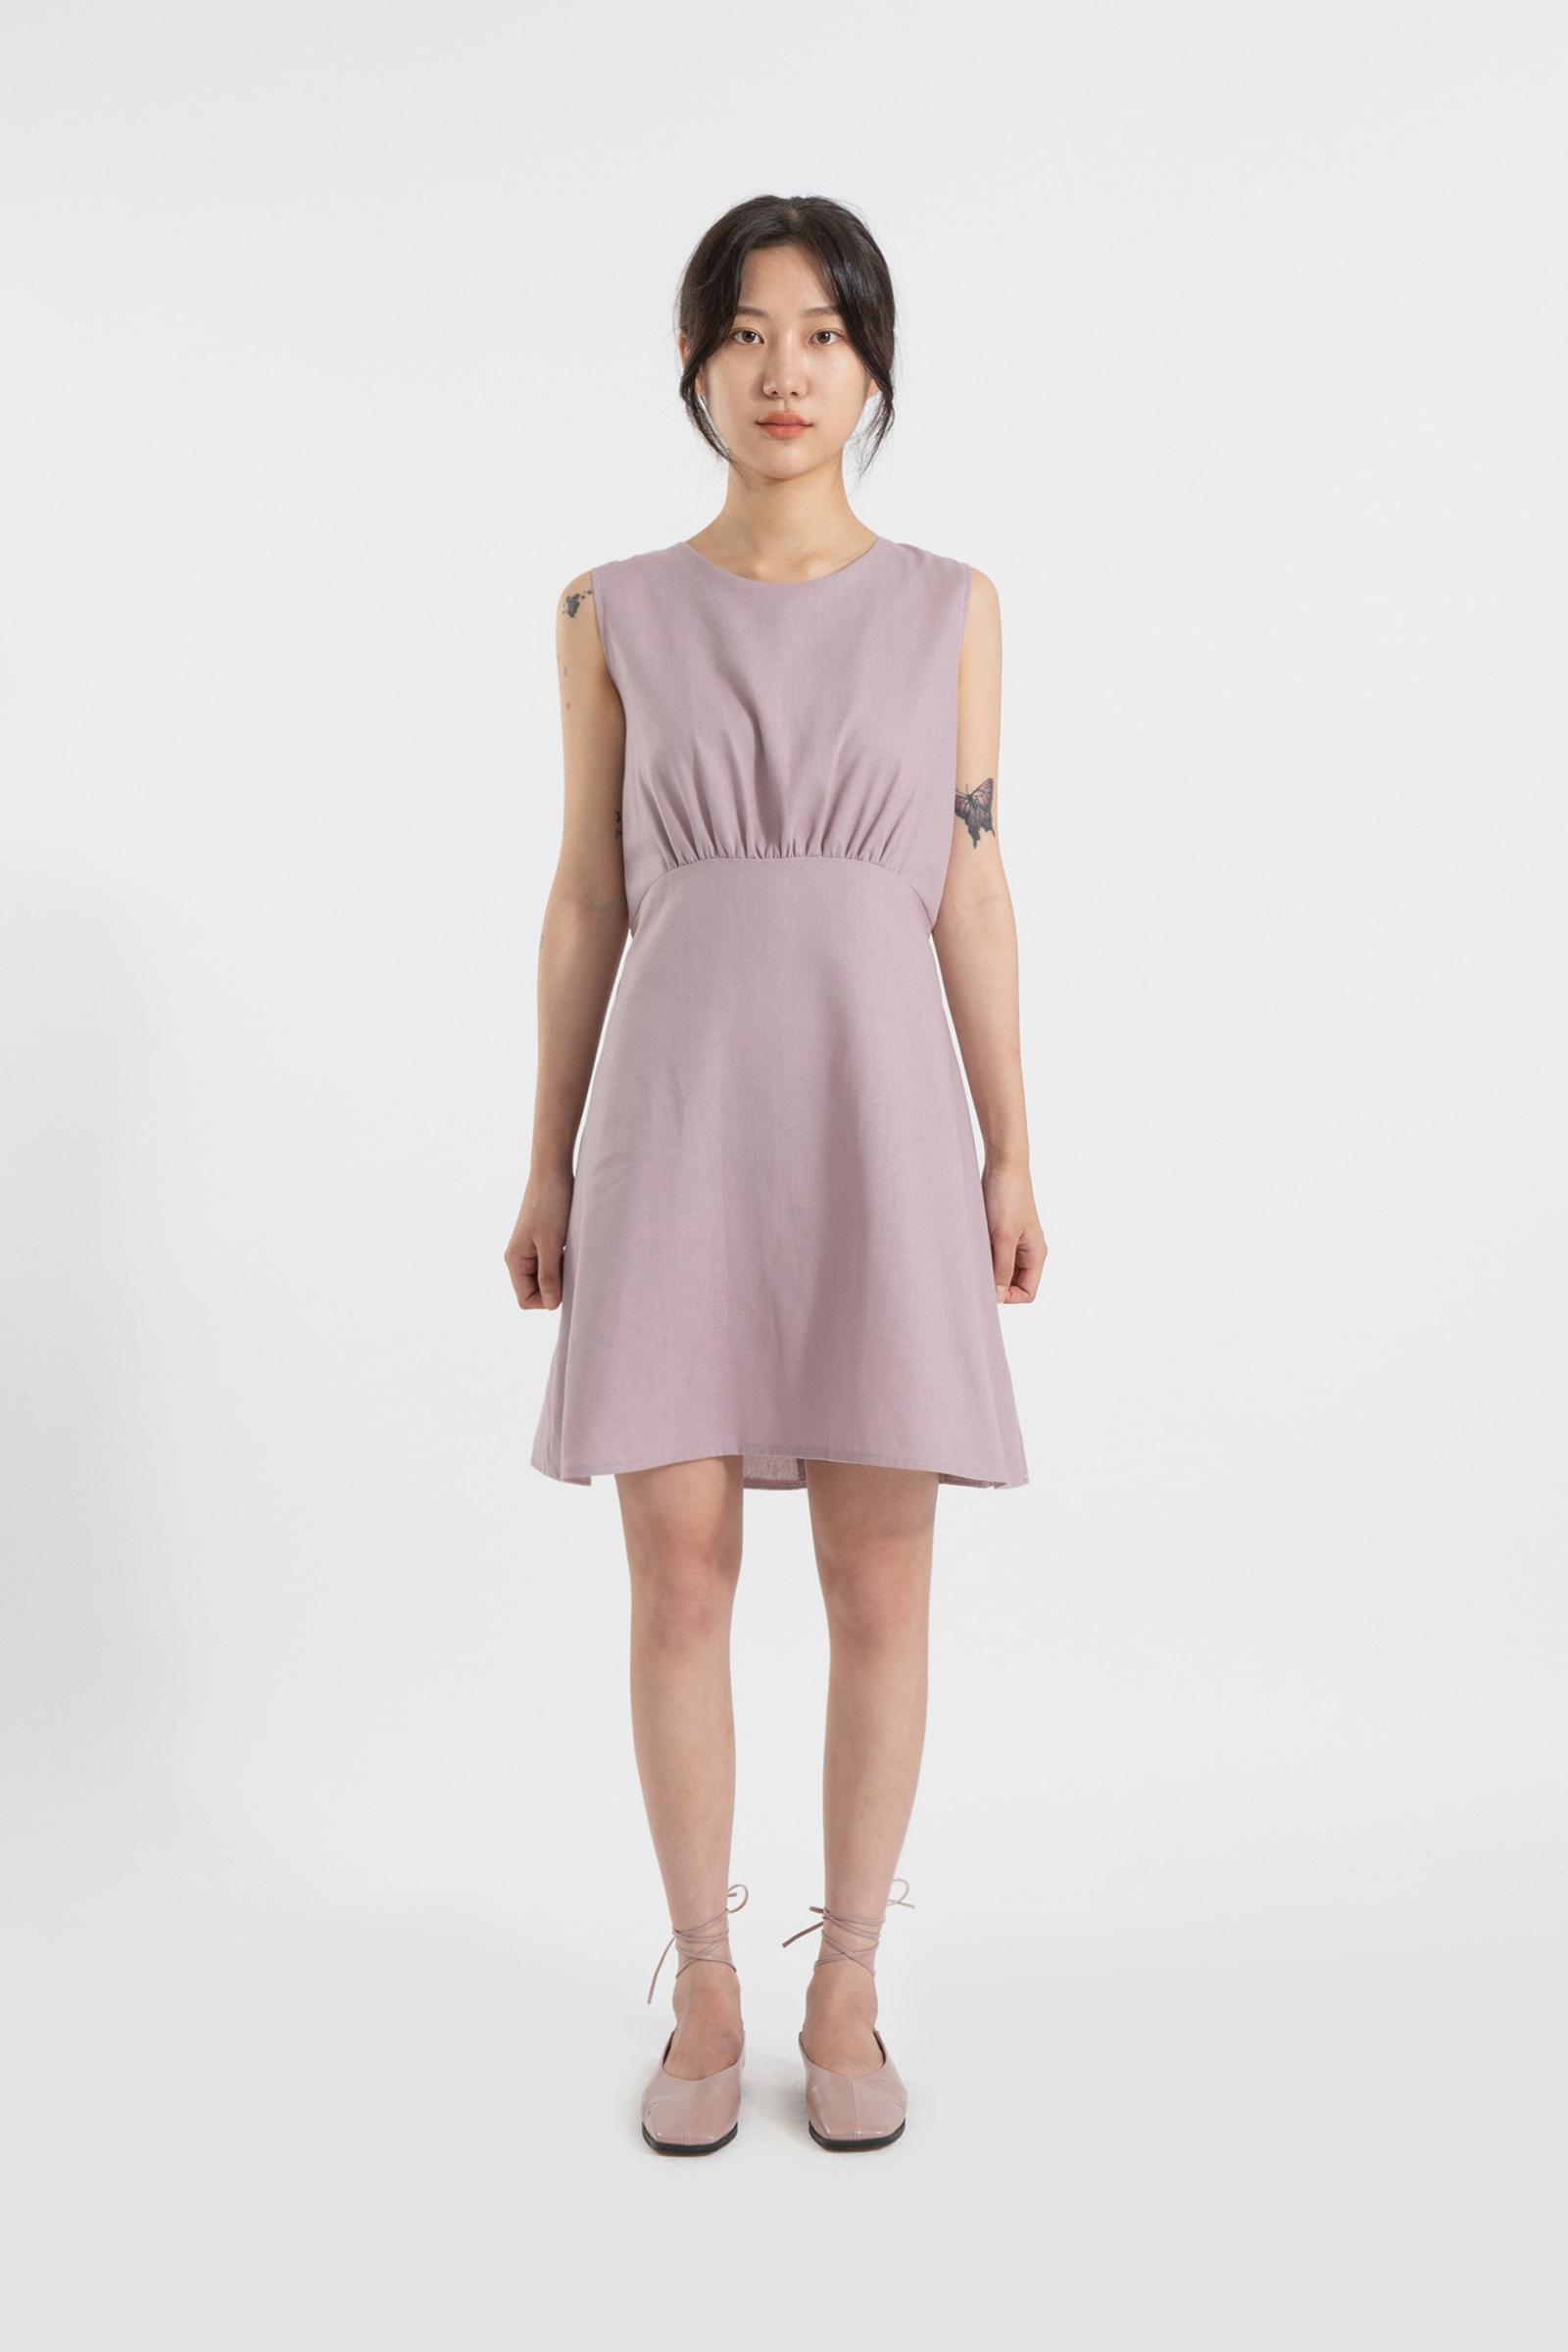 Coco shirring sleeveless midi dress